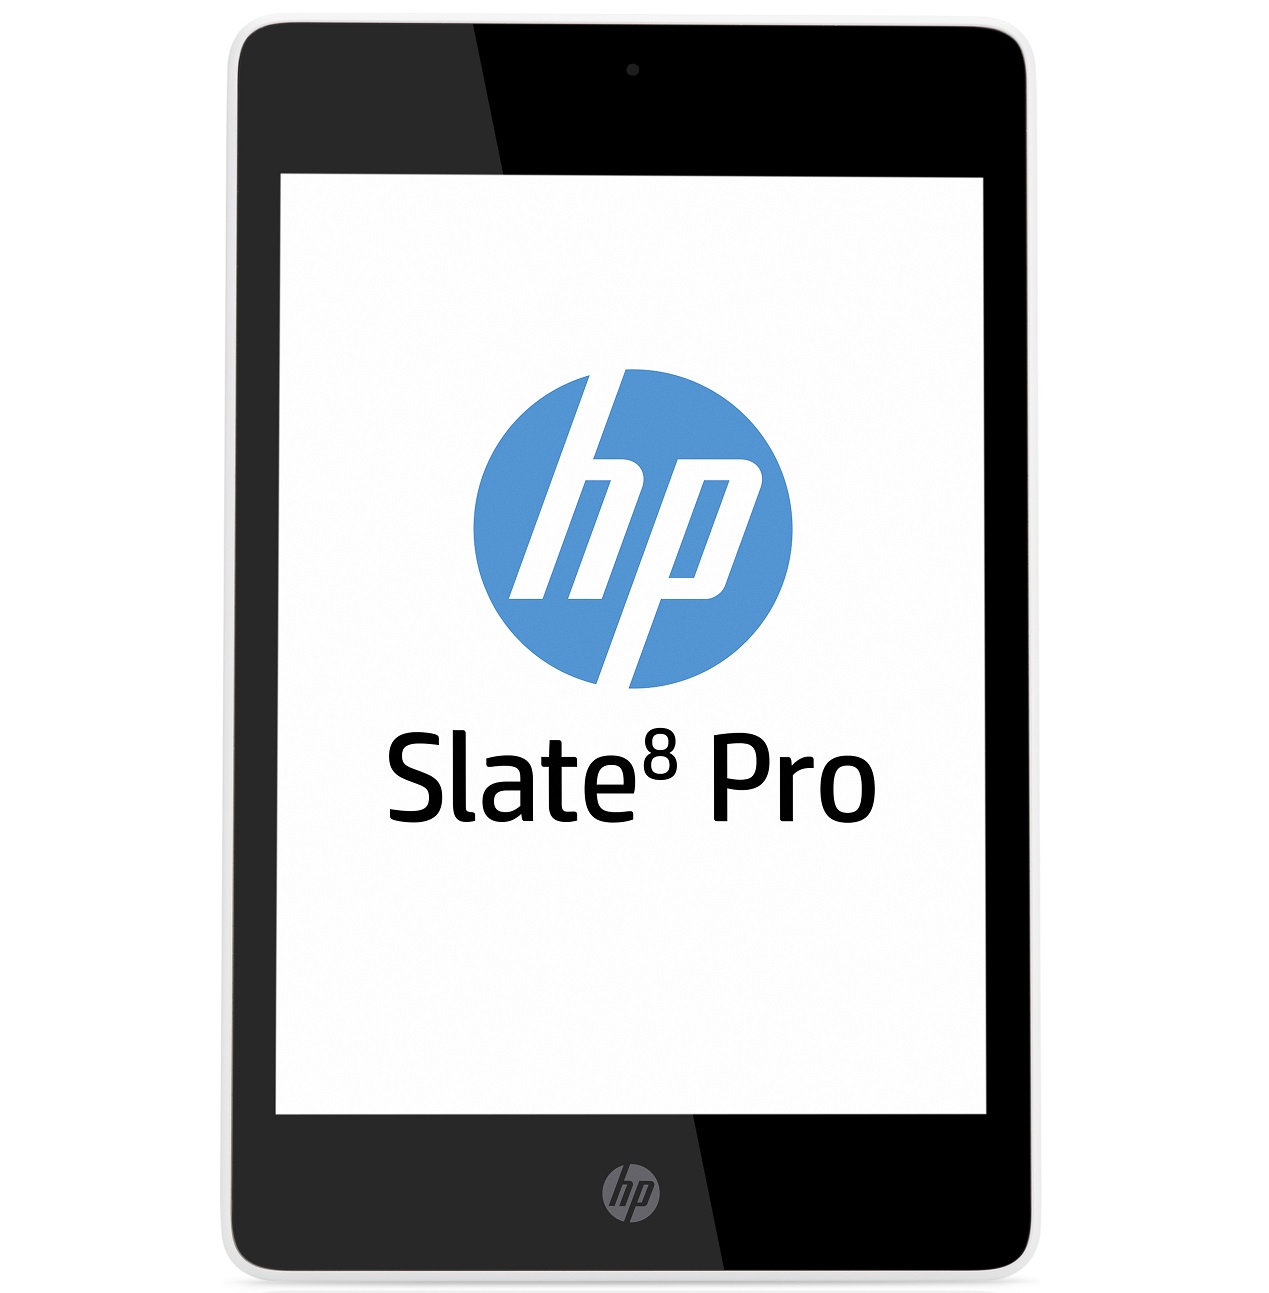 HP Slate 8 Pro (5).jpg